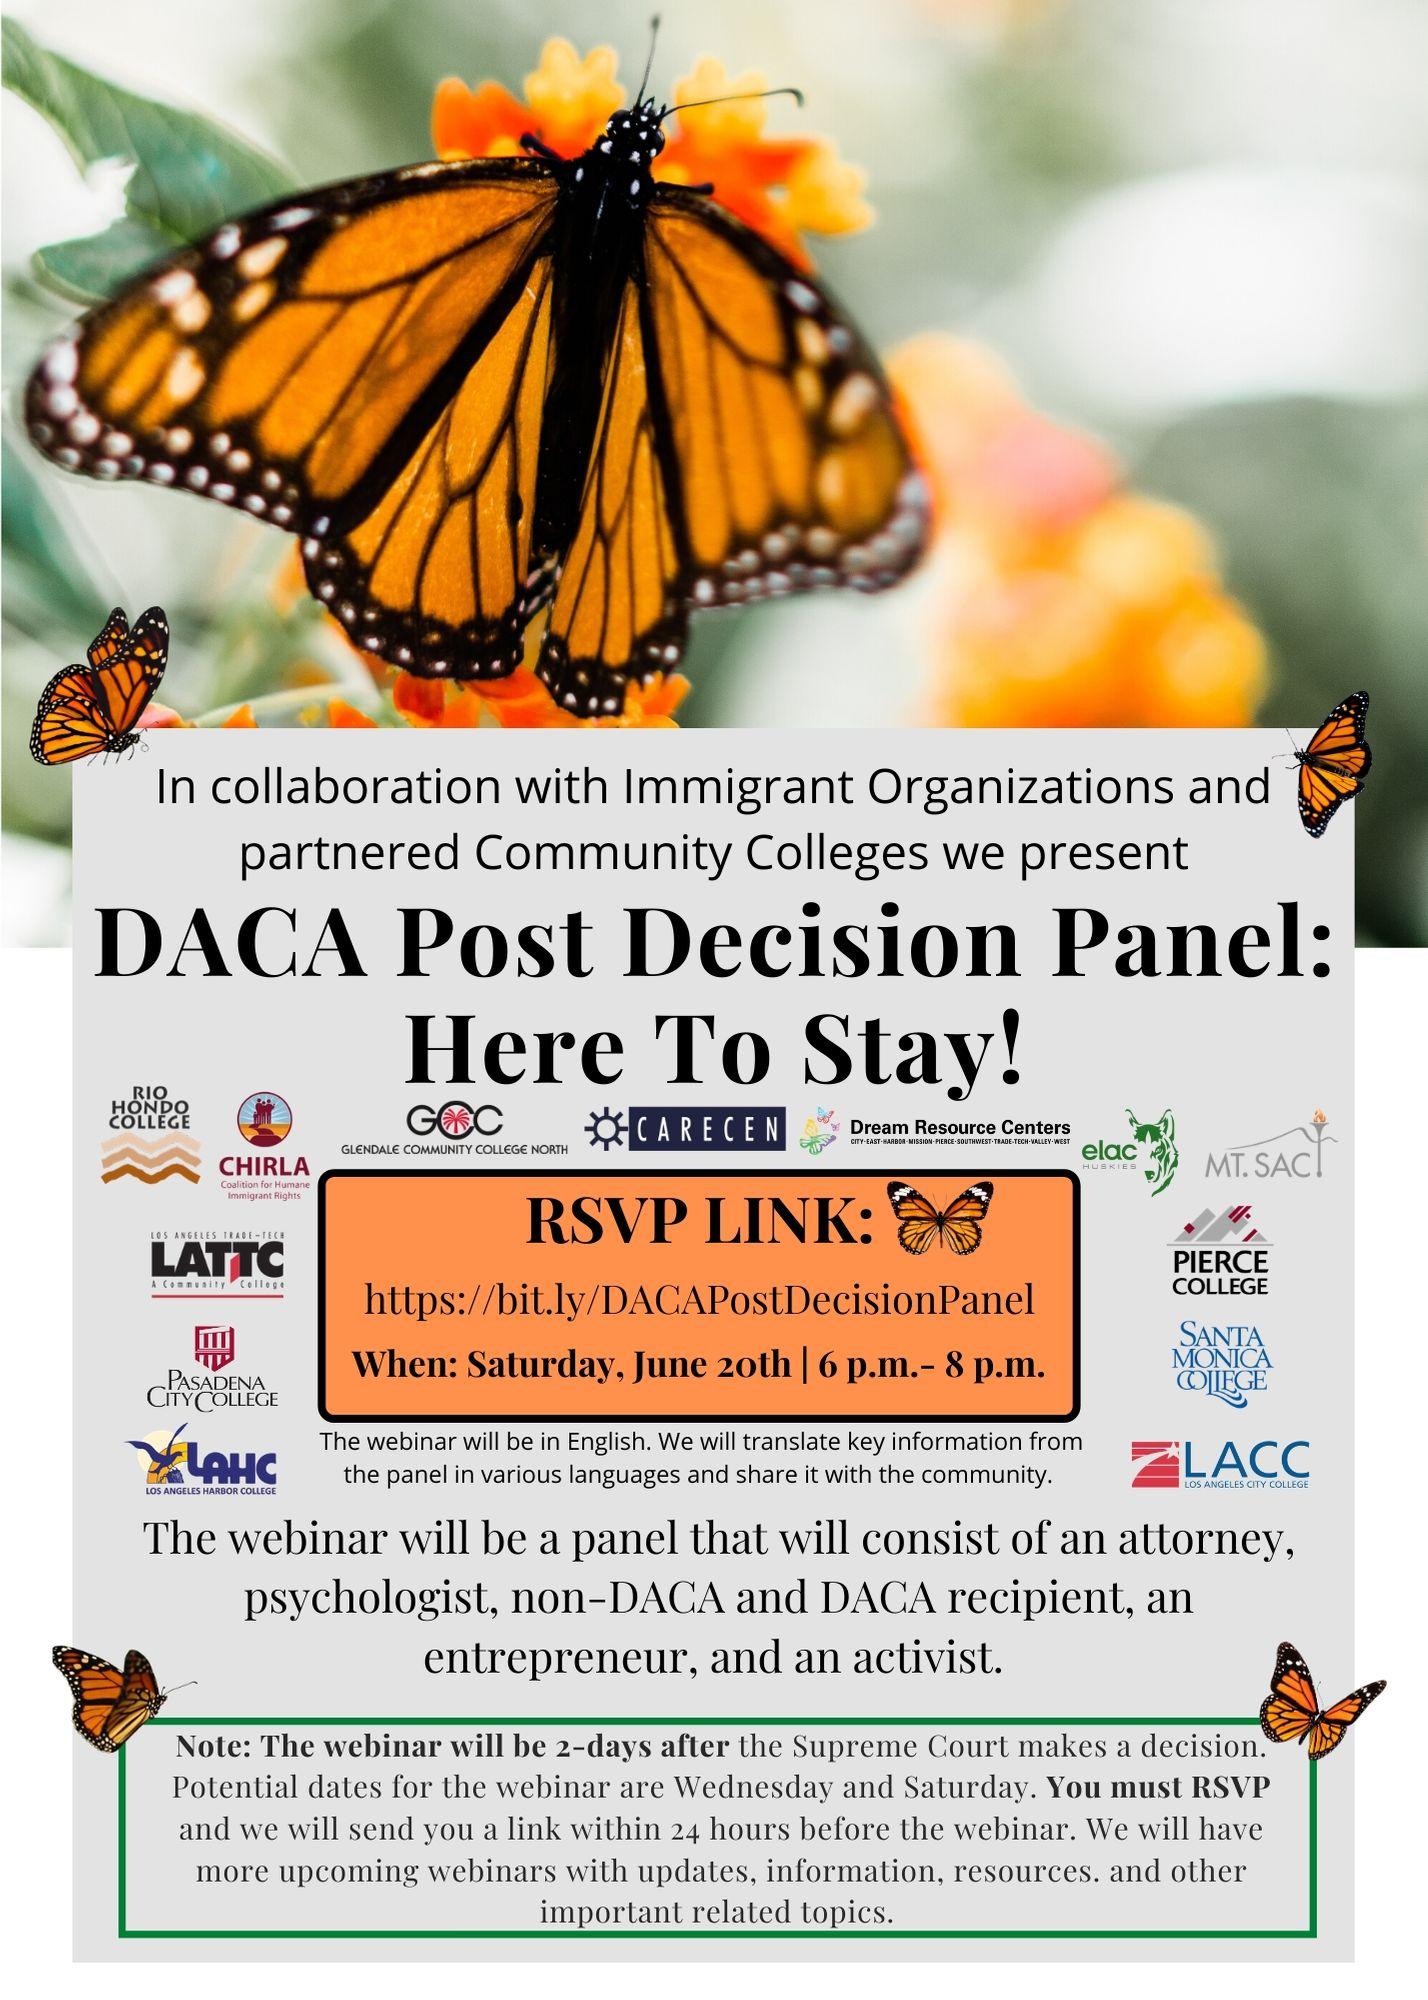 DACA Panel